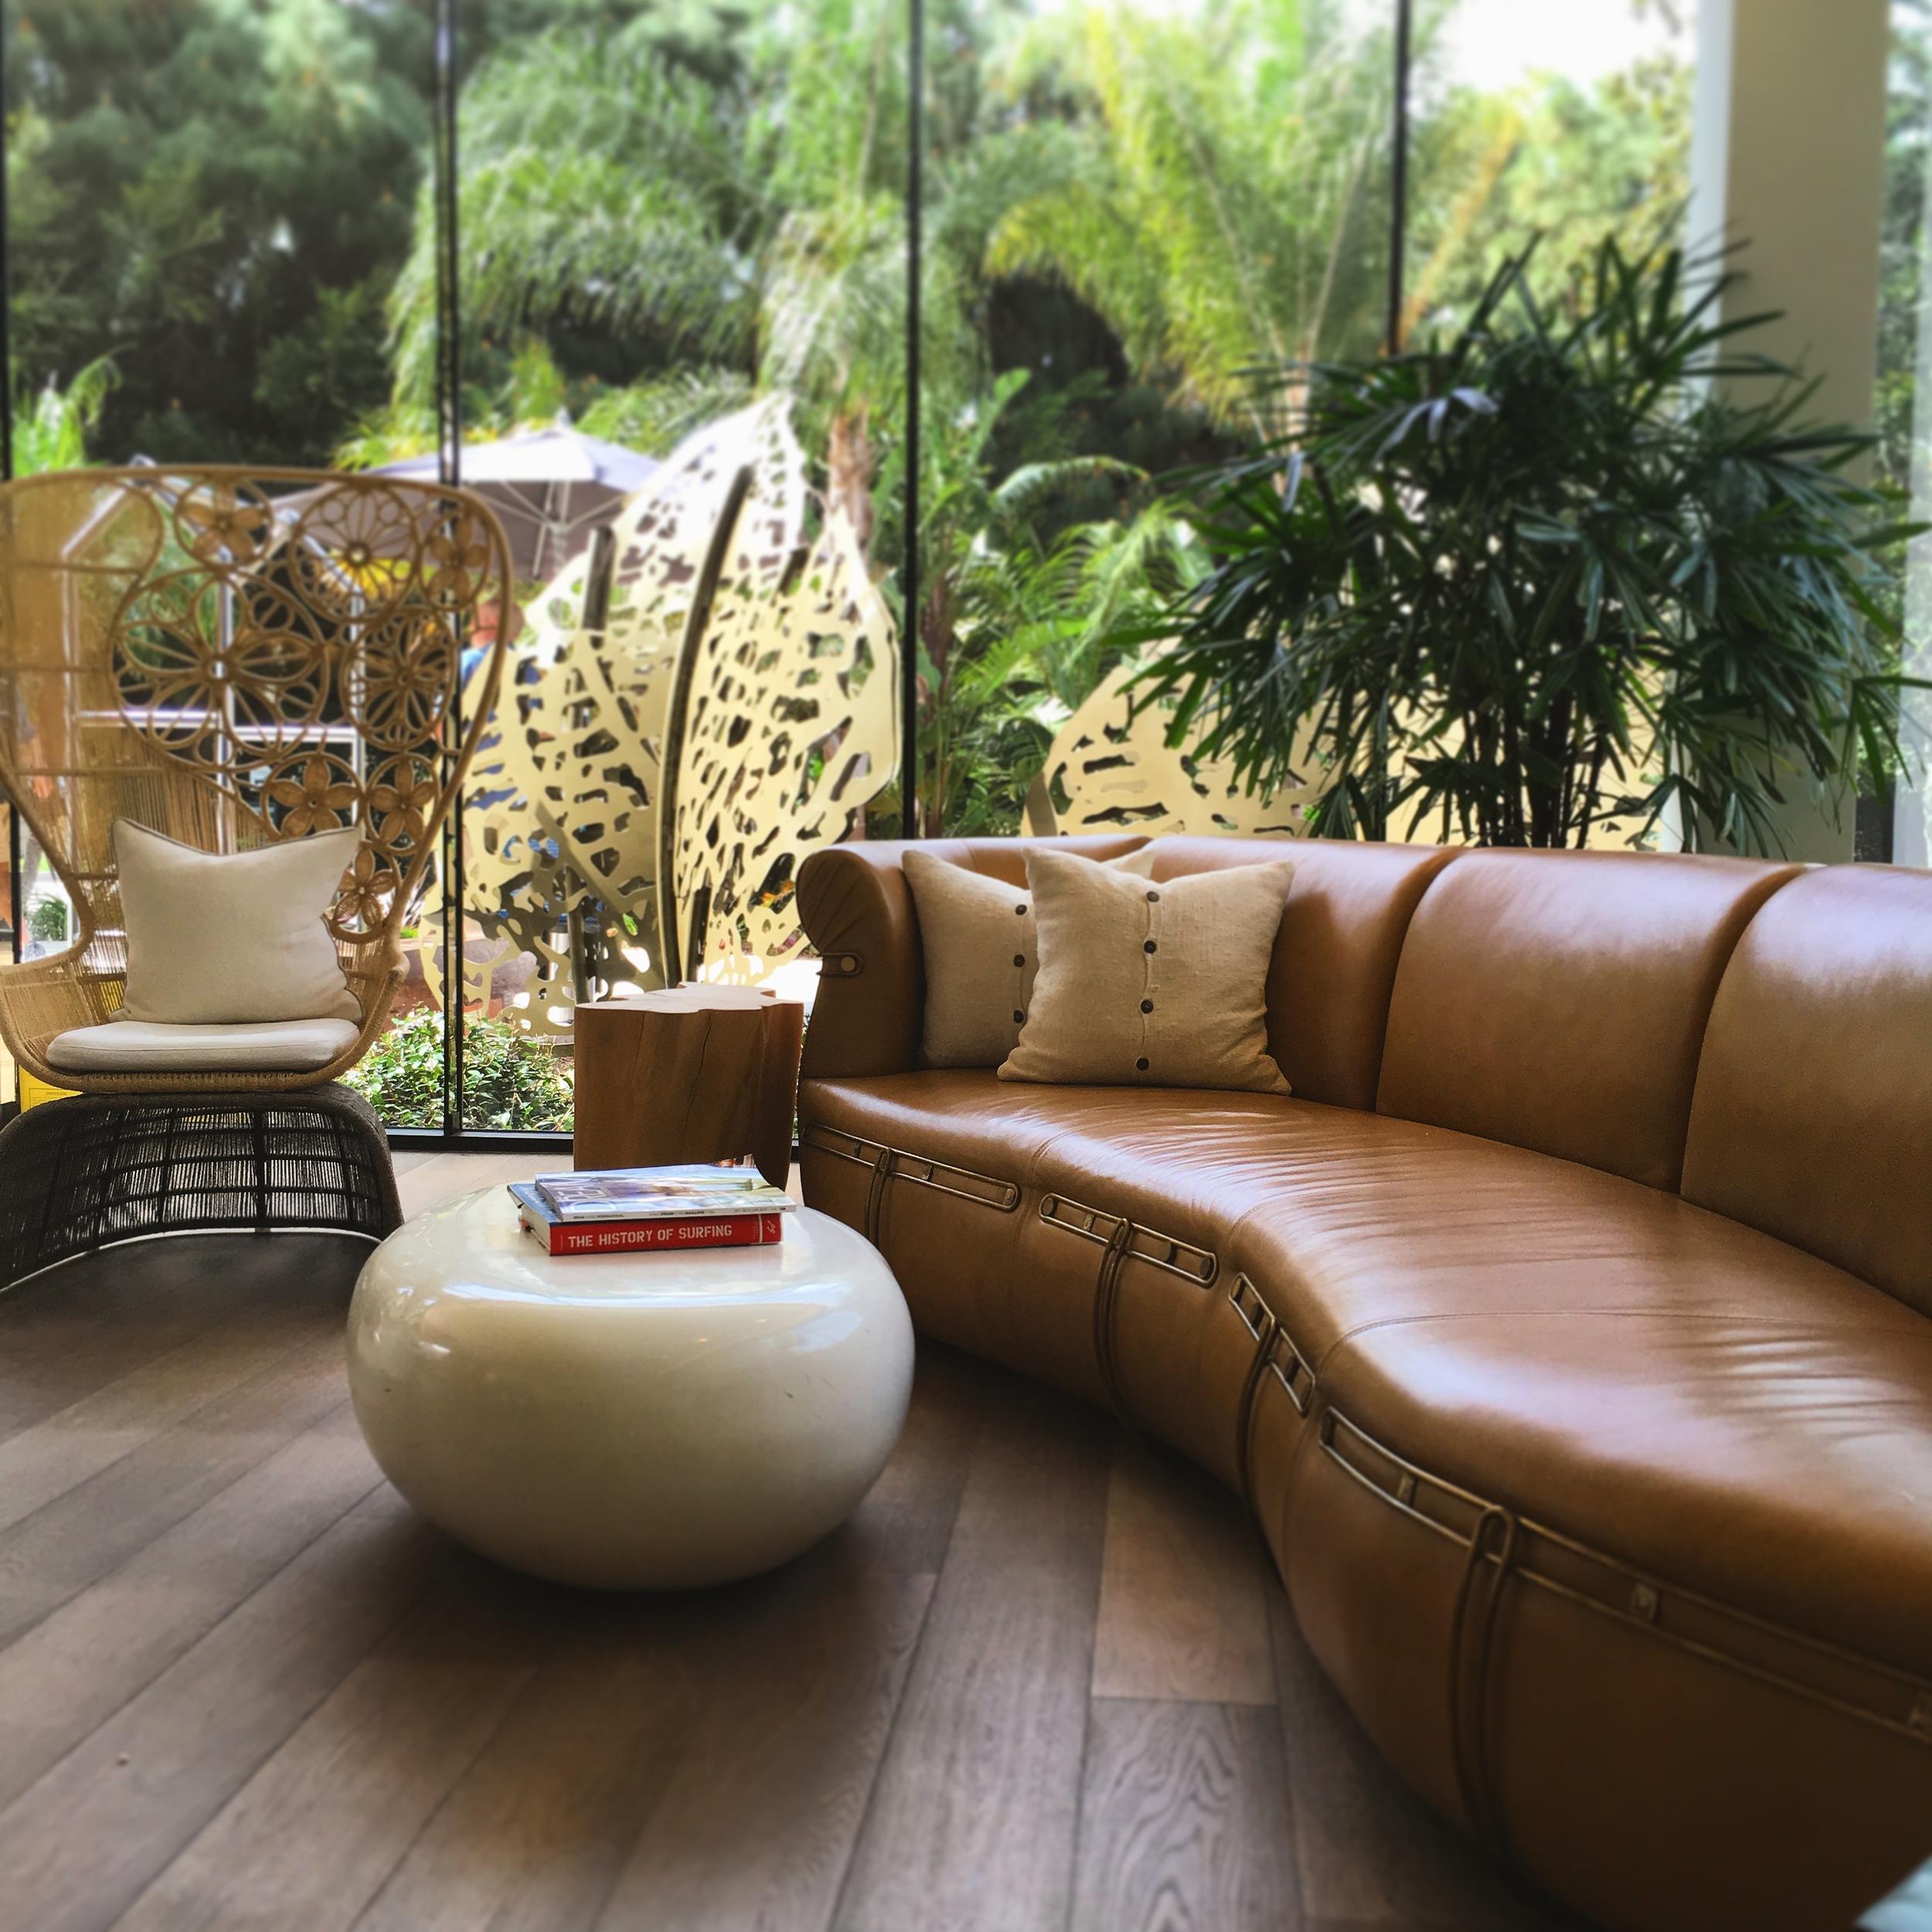 Hotel La Jolla's warm SoCal style is warm and welcoming. [Location: La Jolla]